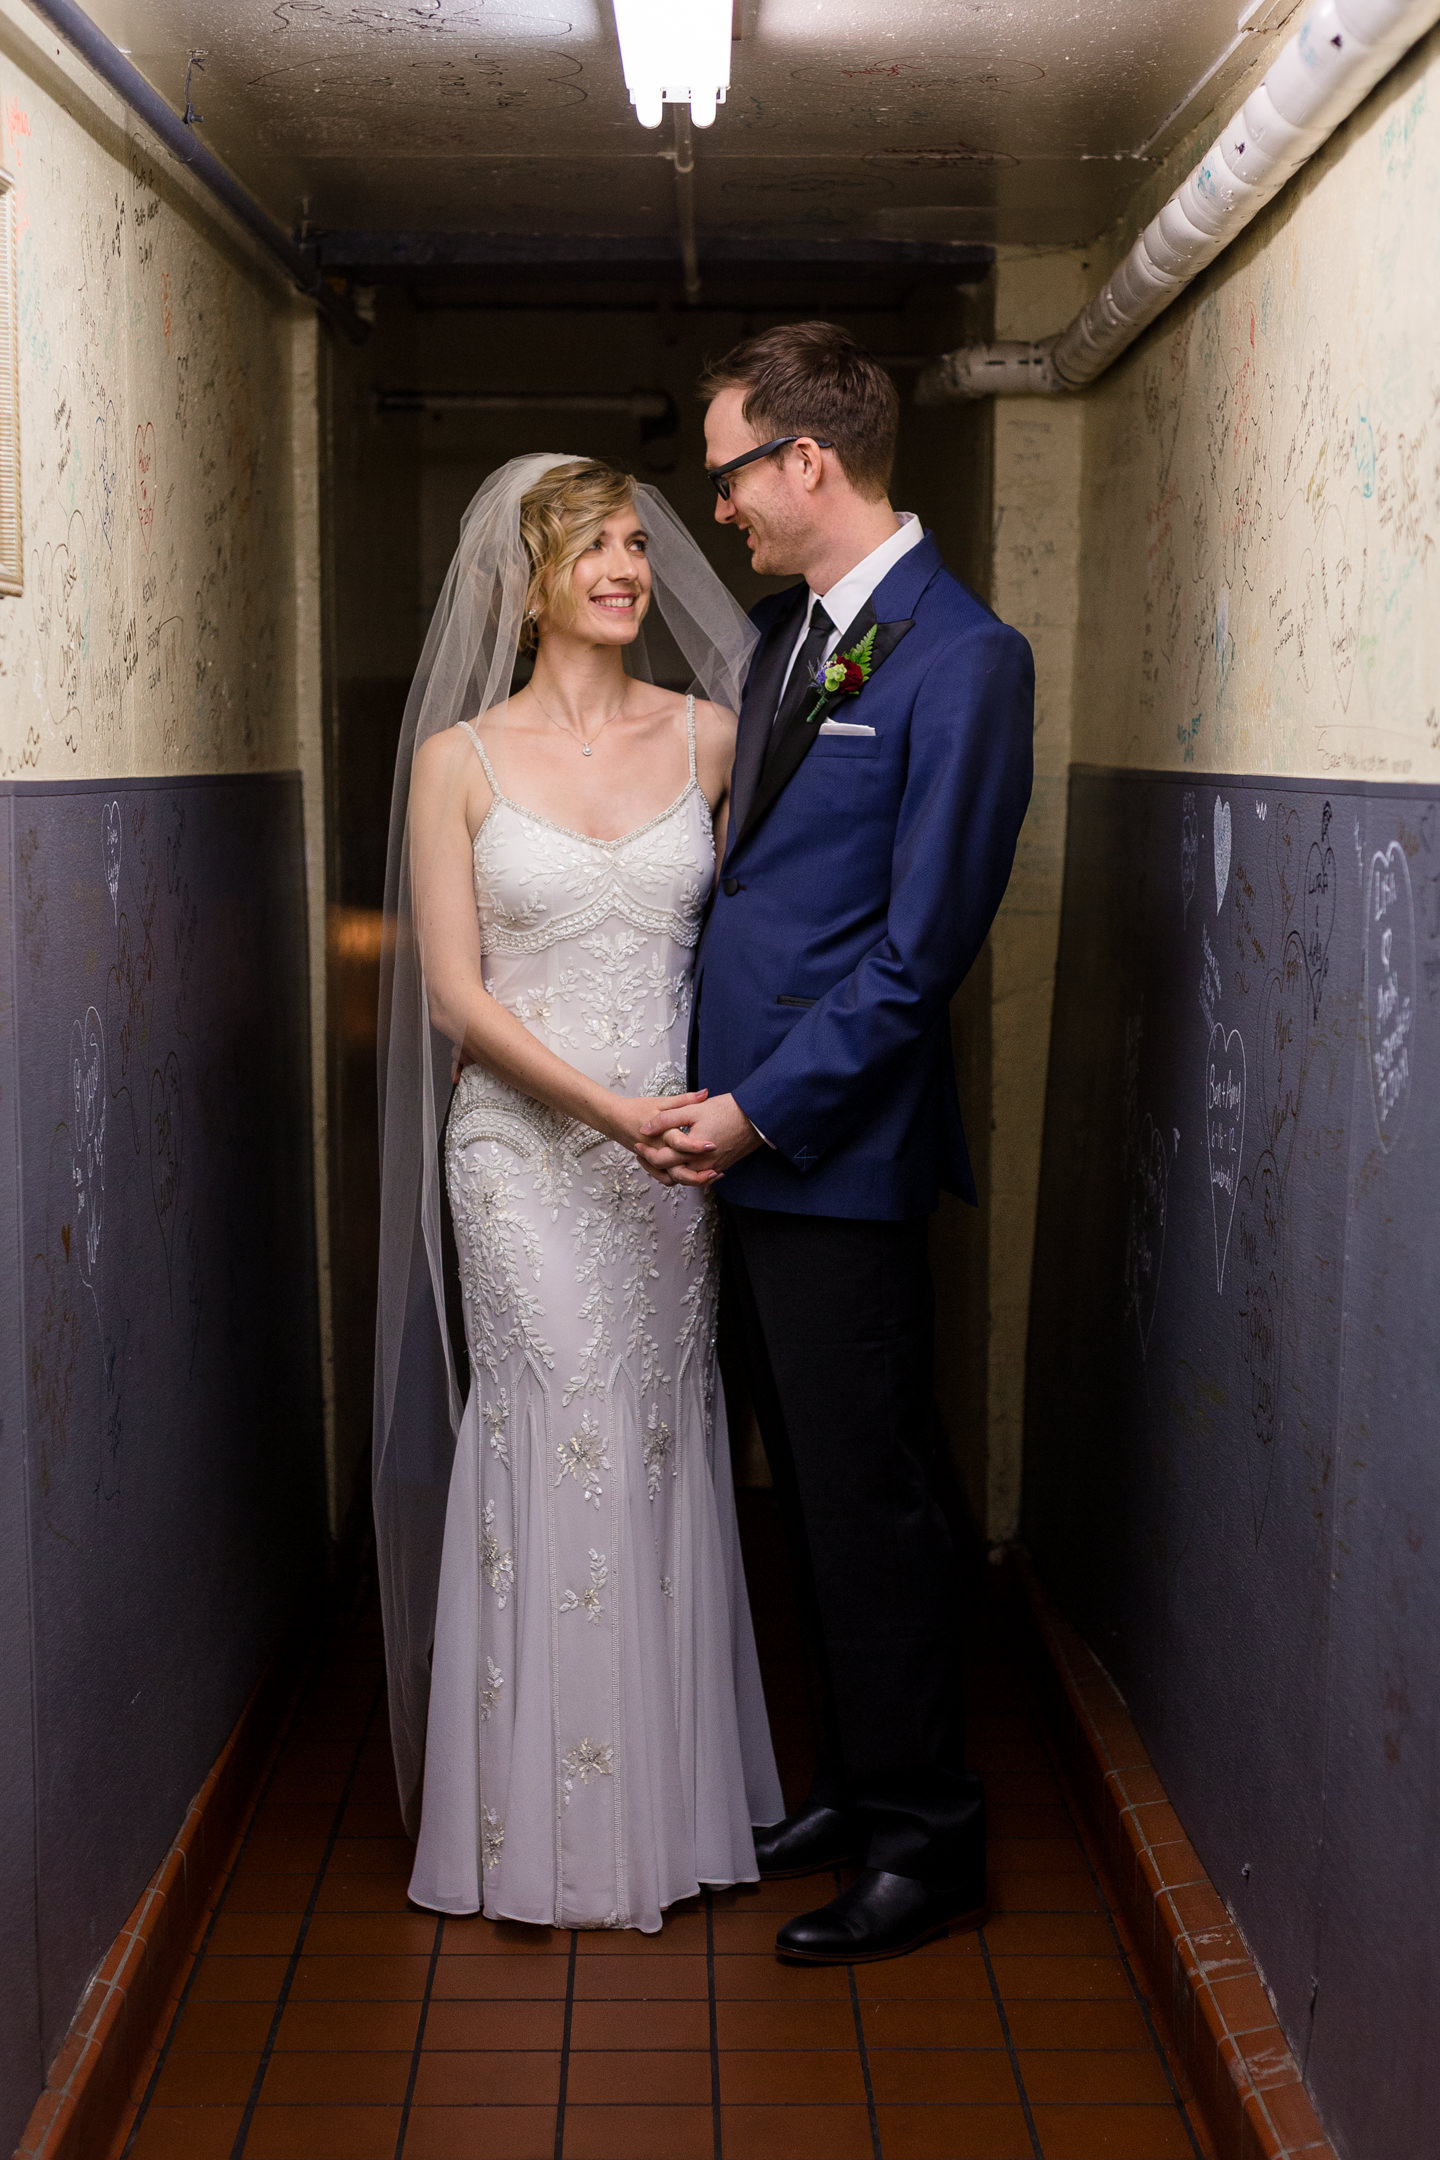 Documentary-Wedding-Photography-Andrew-Tat-Gabi & Kim-23.jpg